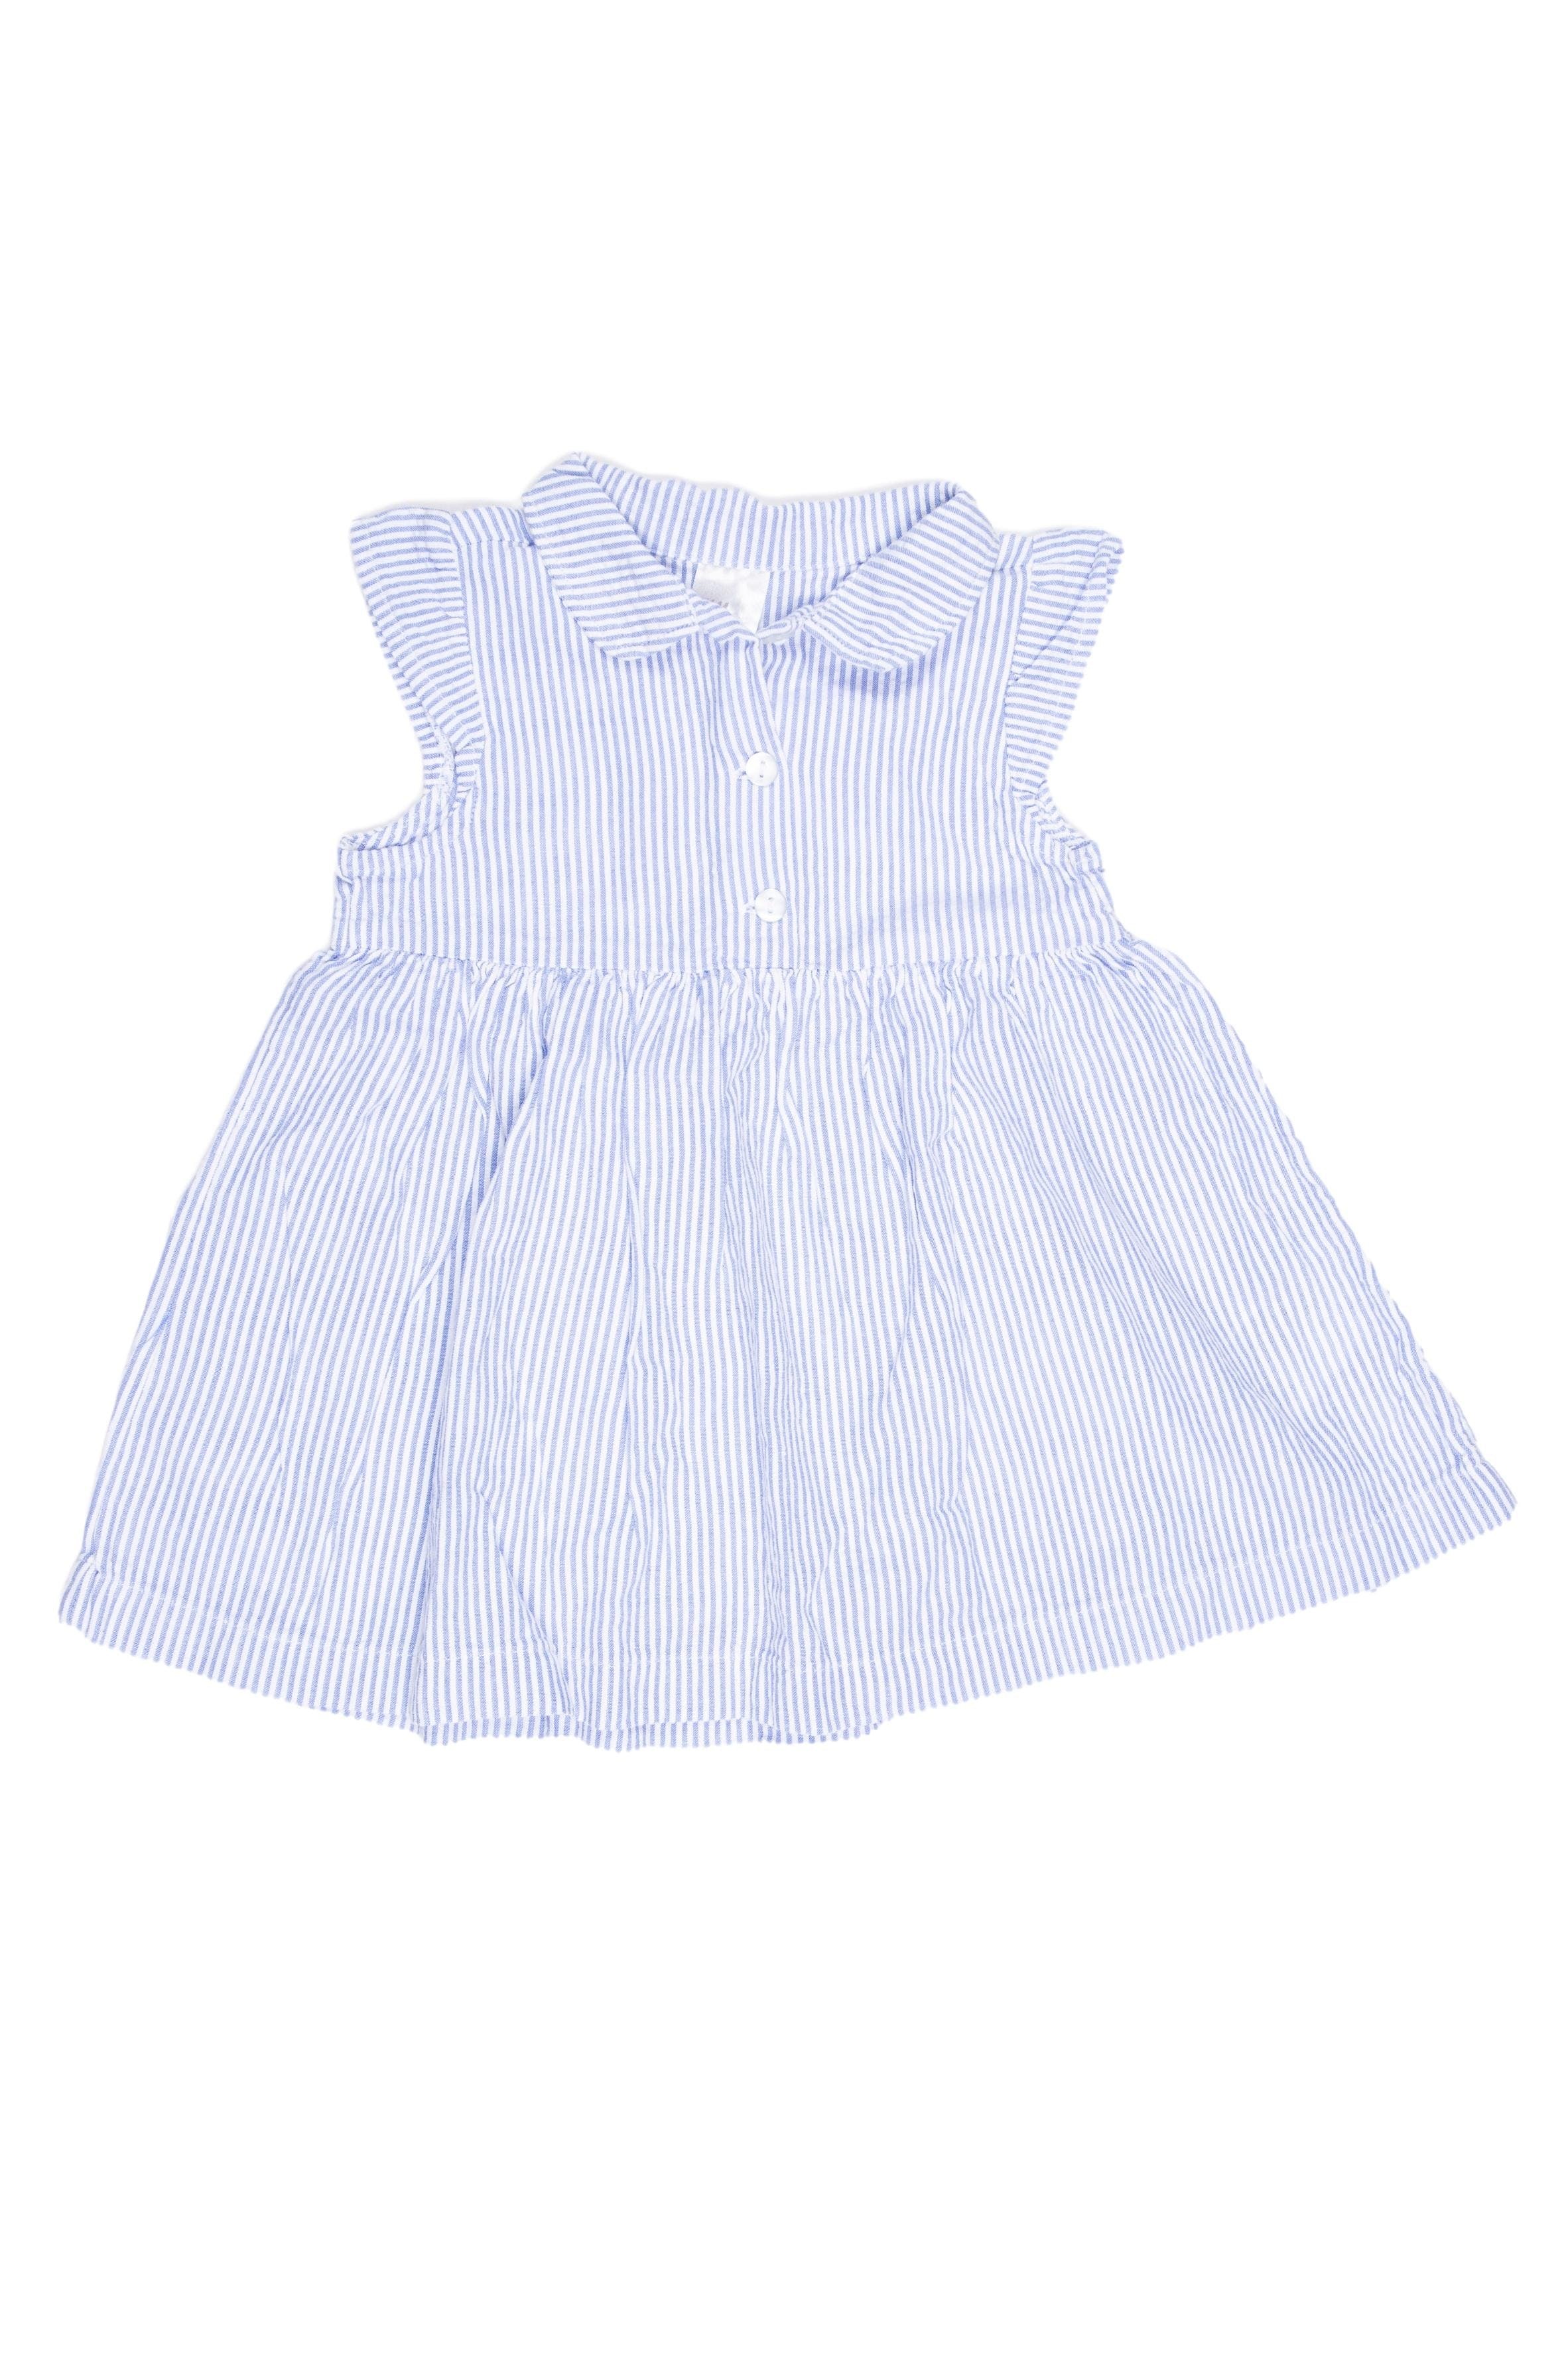 Vestido azul a rayas 100% algodón - H & M